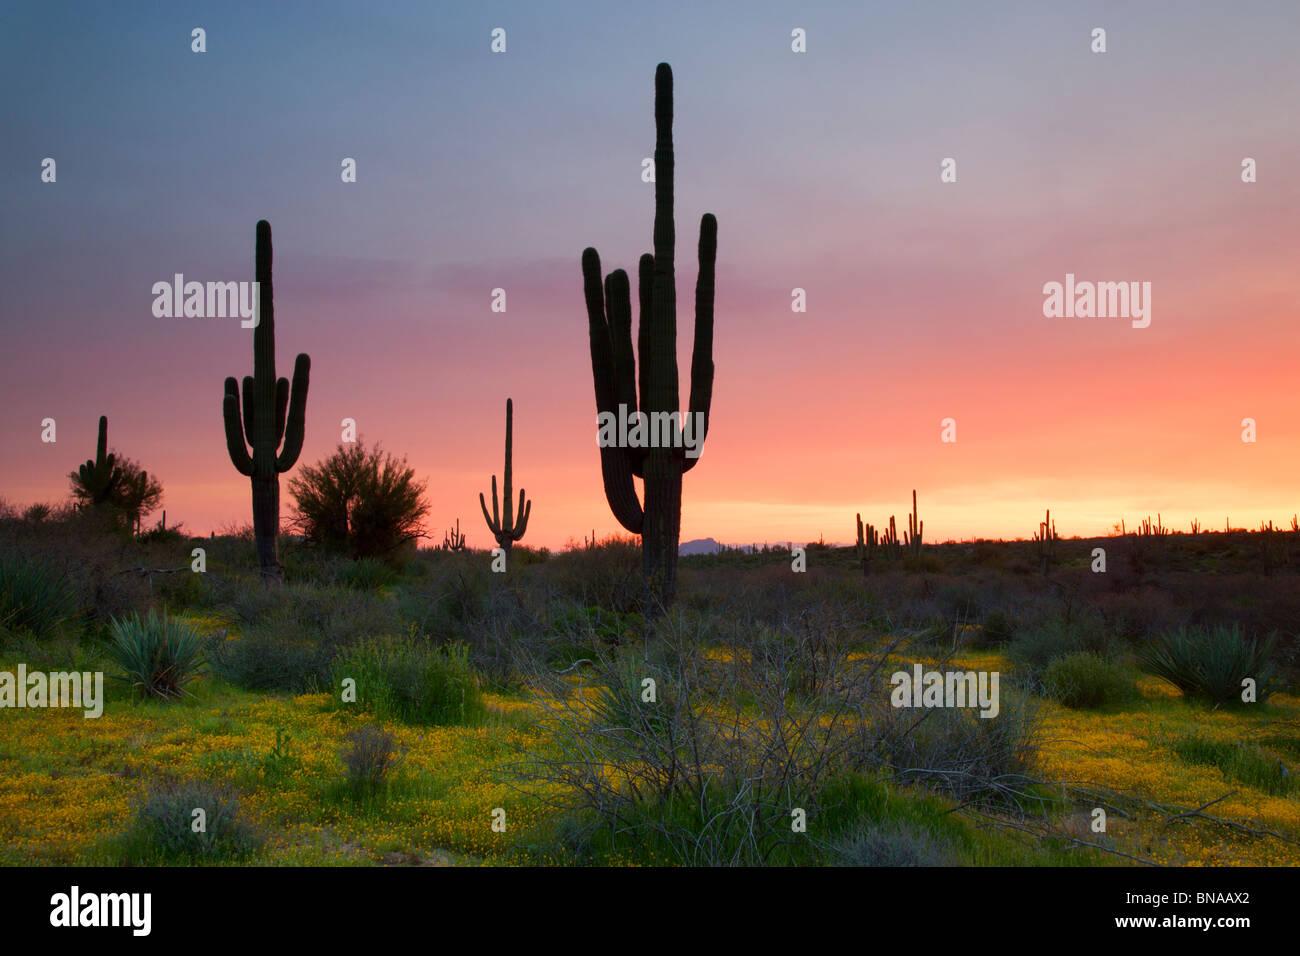 Tonto National Forest, East of Phoenix, Arizona. - Stock Image